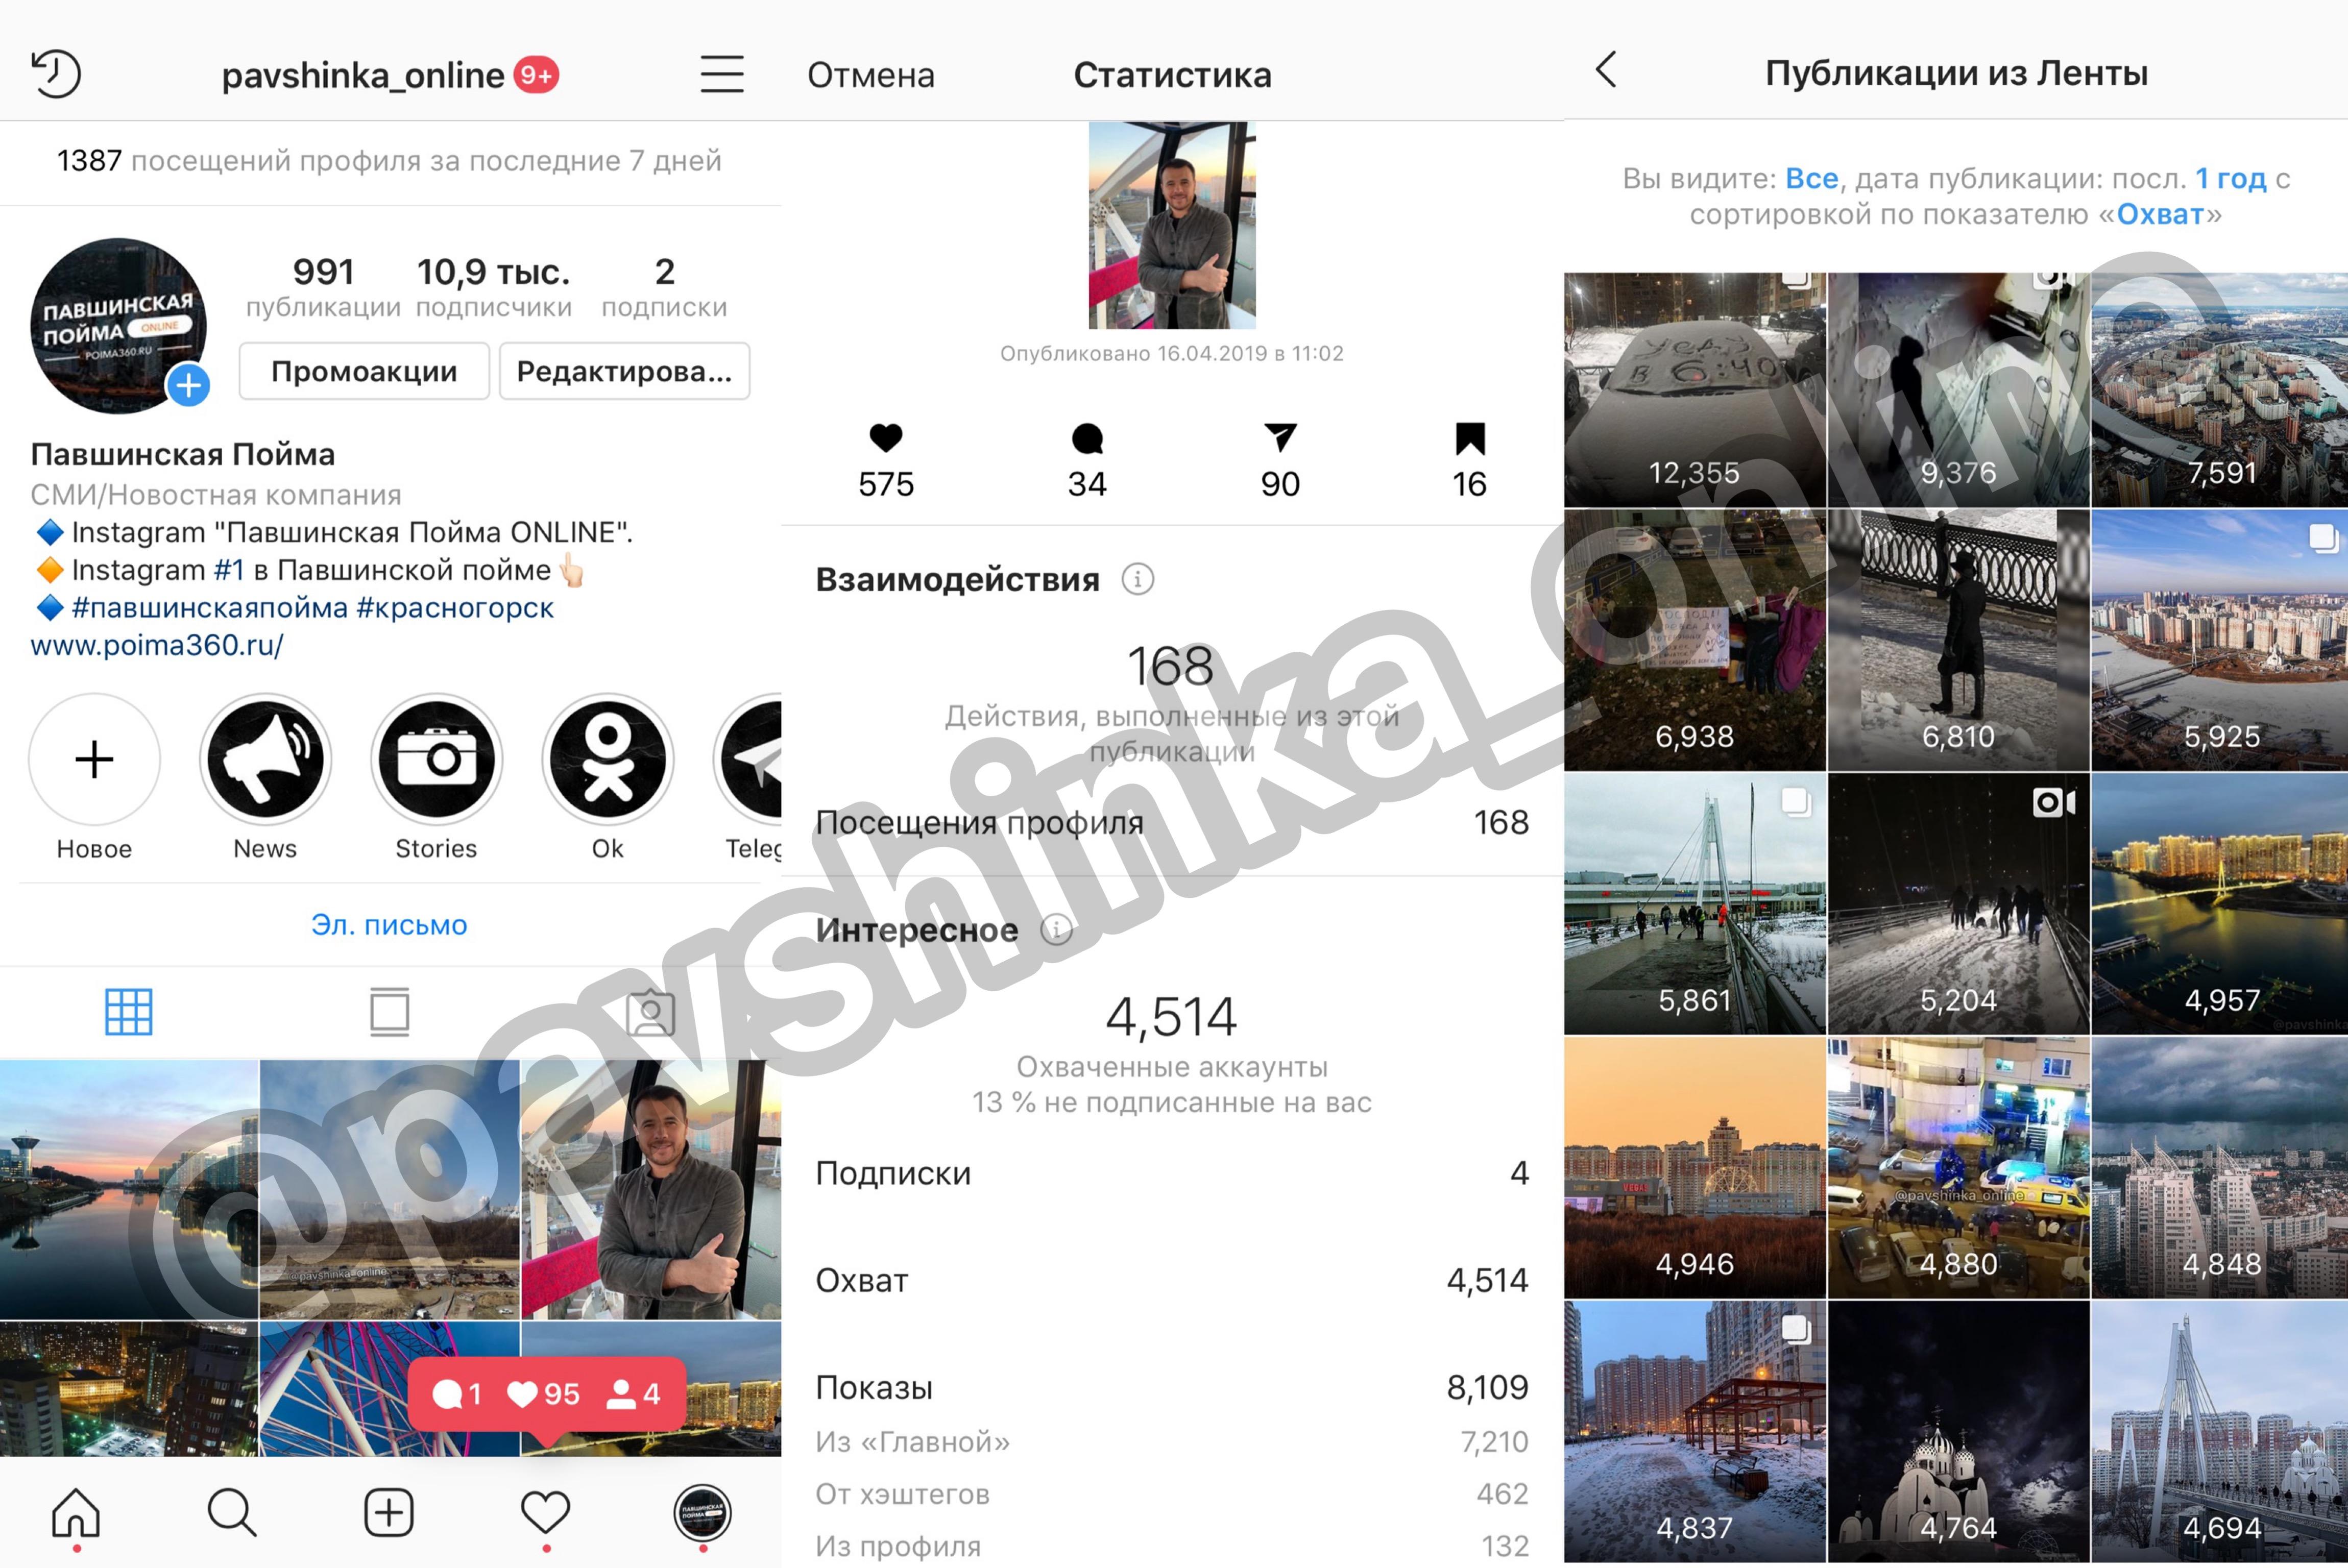 Instagram Павшинской поймы pavshinka_online